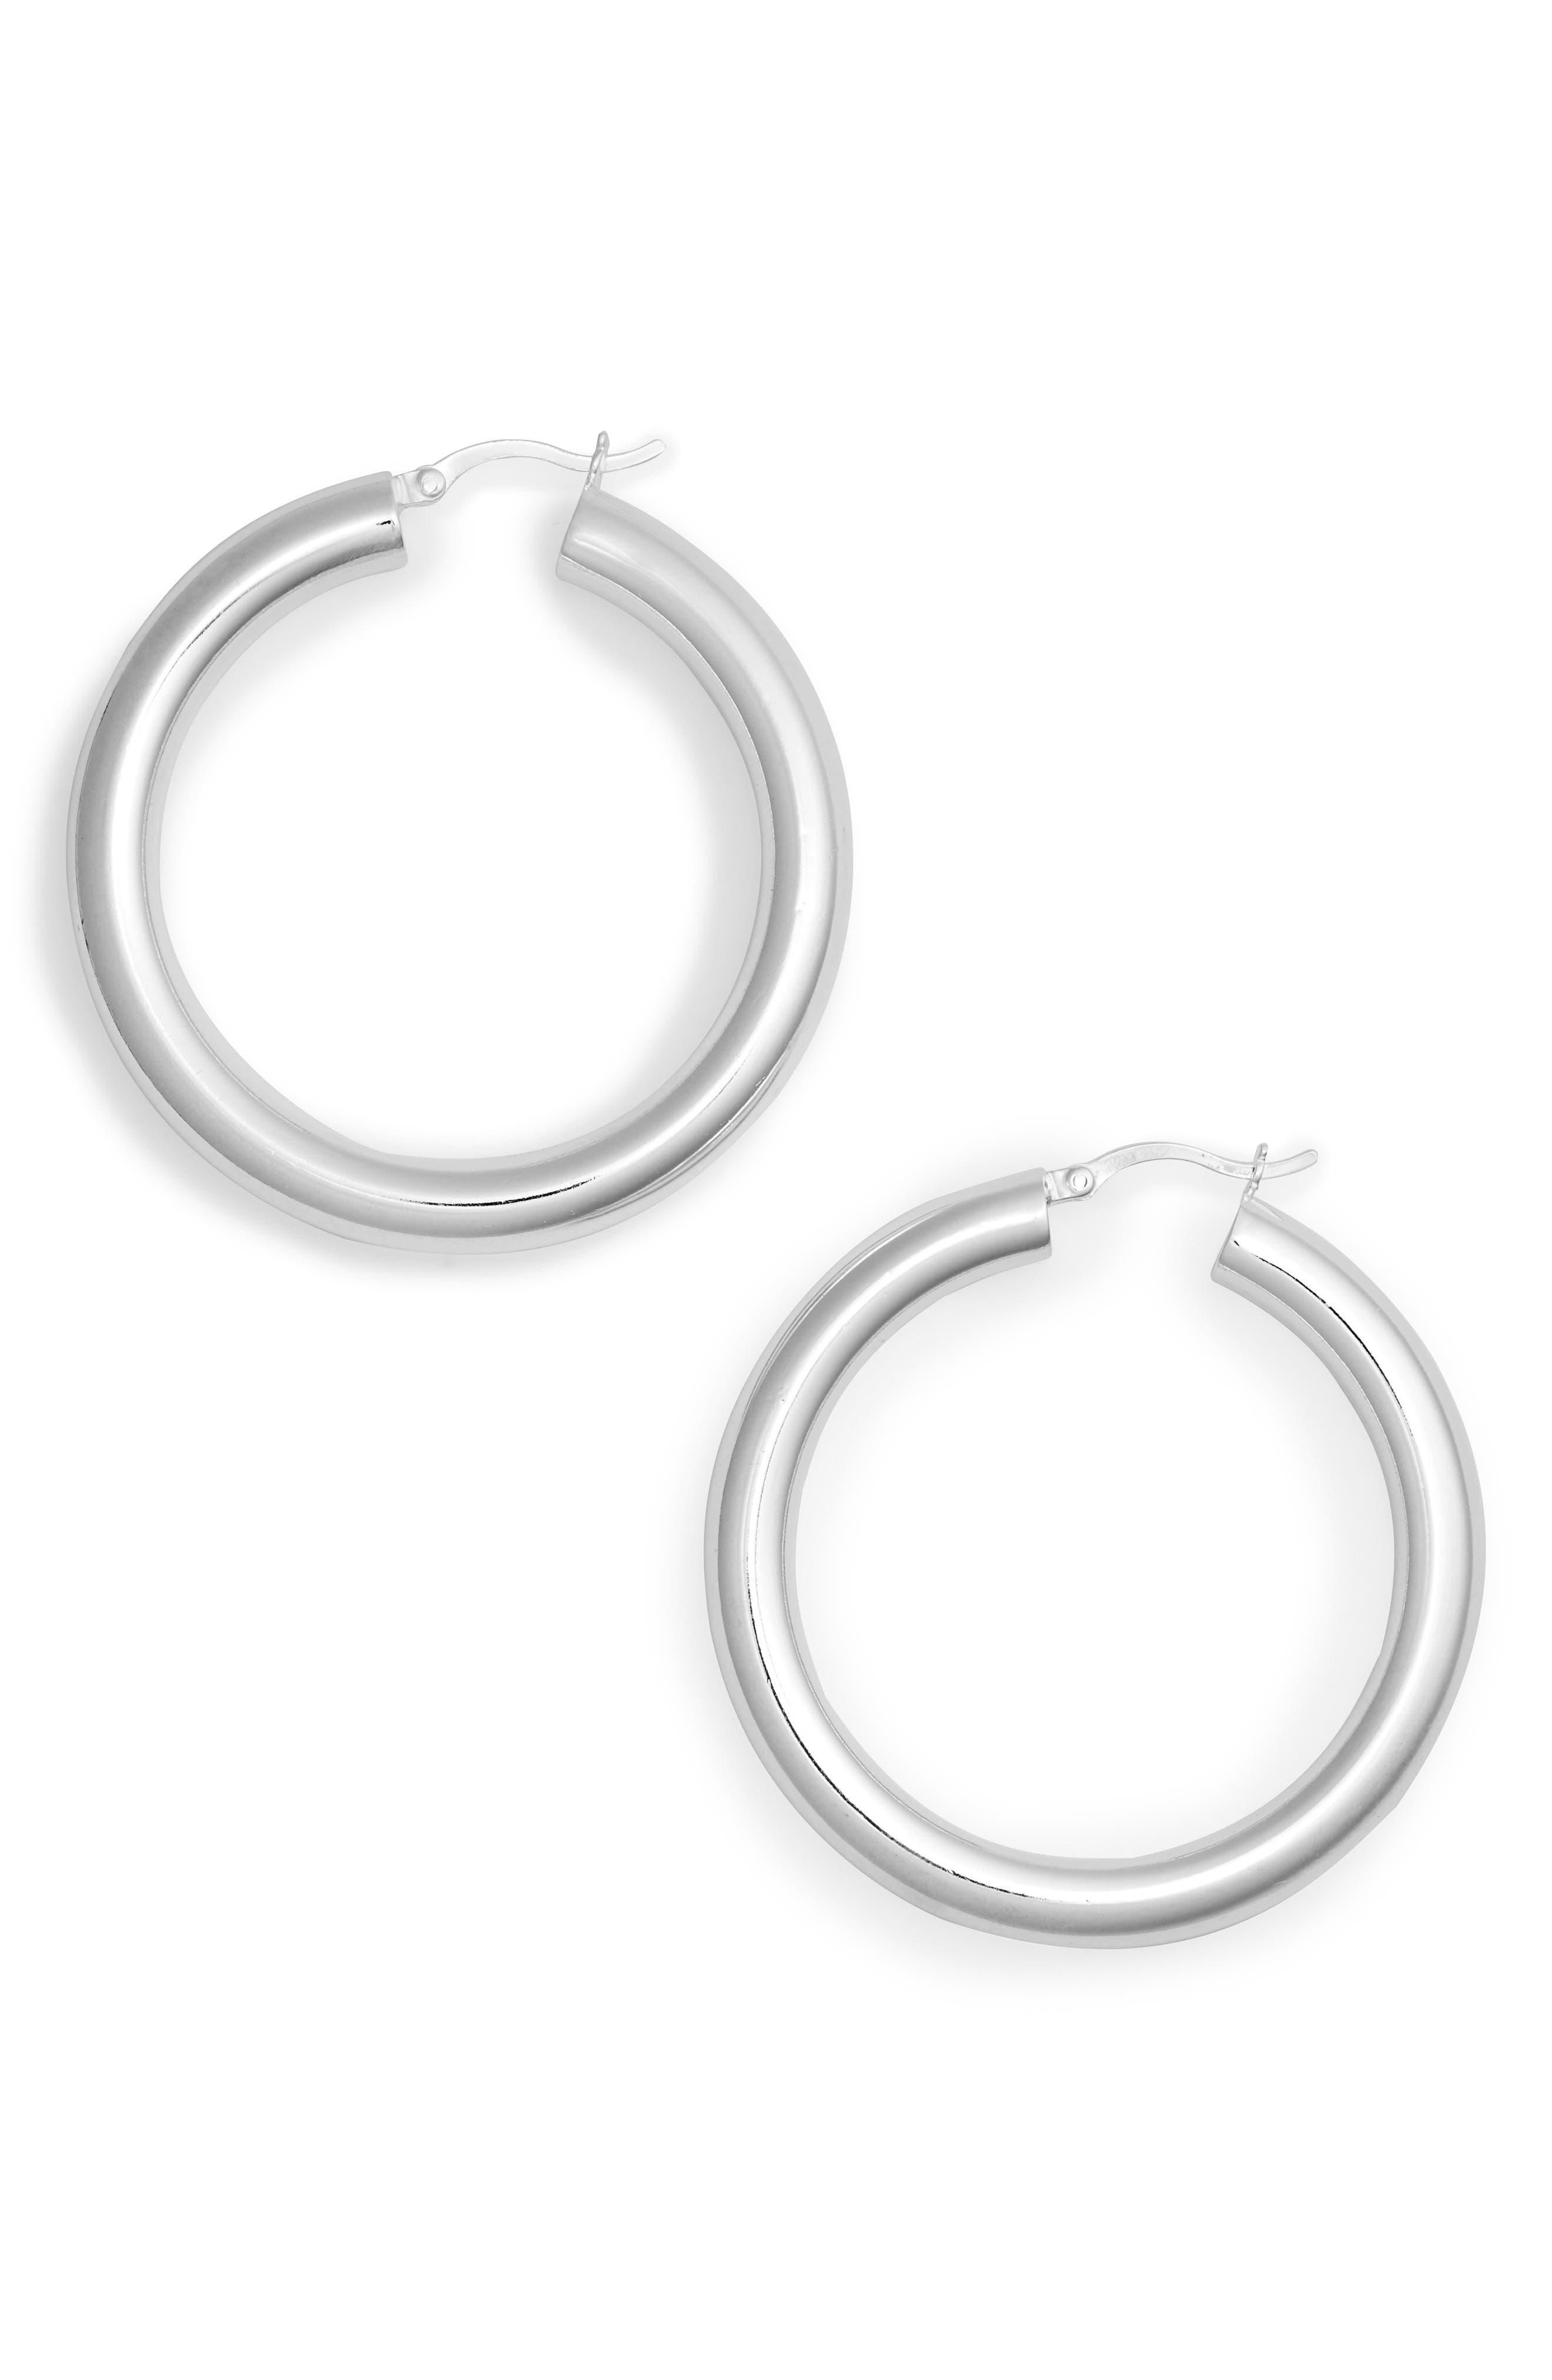 ARGENTO VIVO, Medium Hollow Hoop Earrings, Main thumbnail 1, color, SILVER